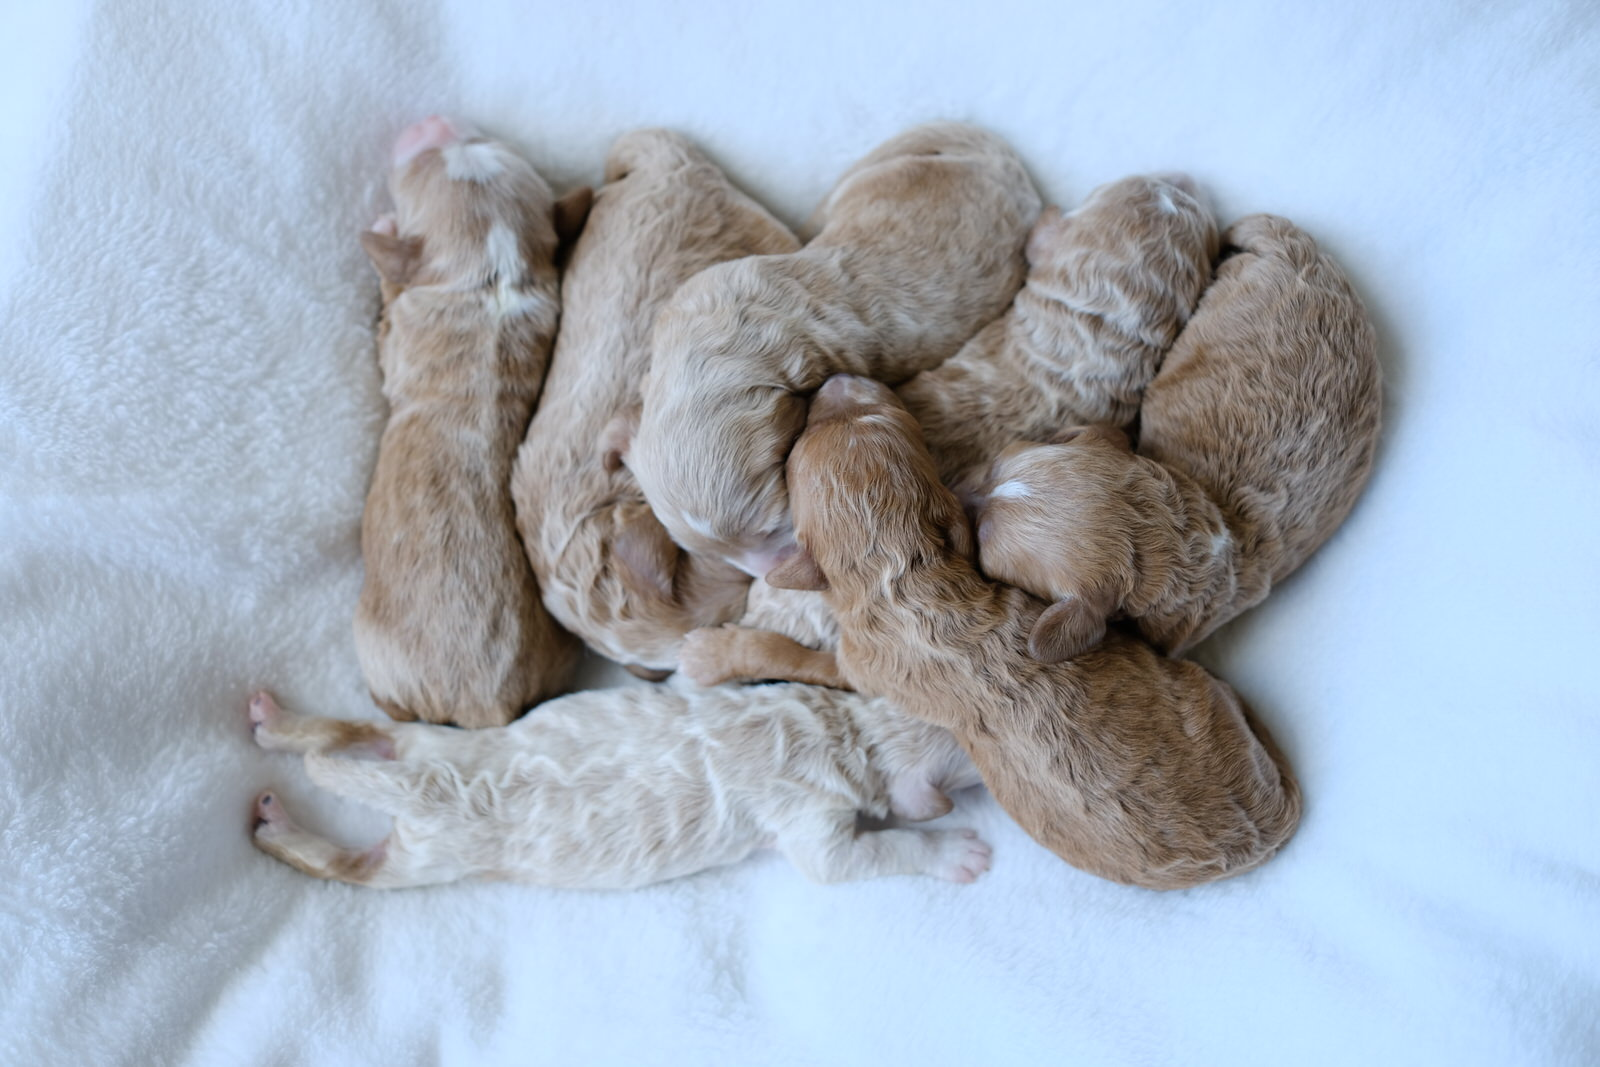 newborn cavapoochon puppies